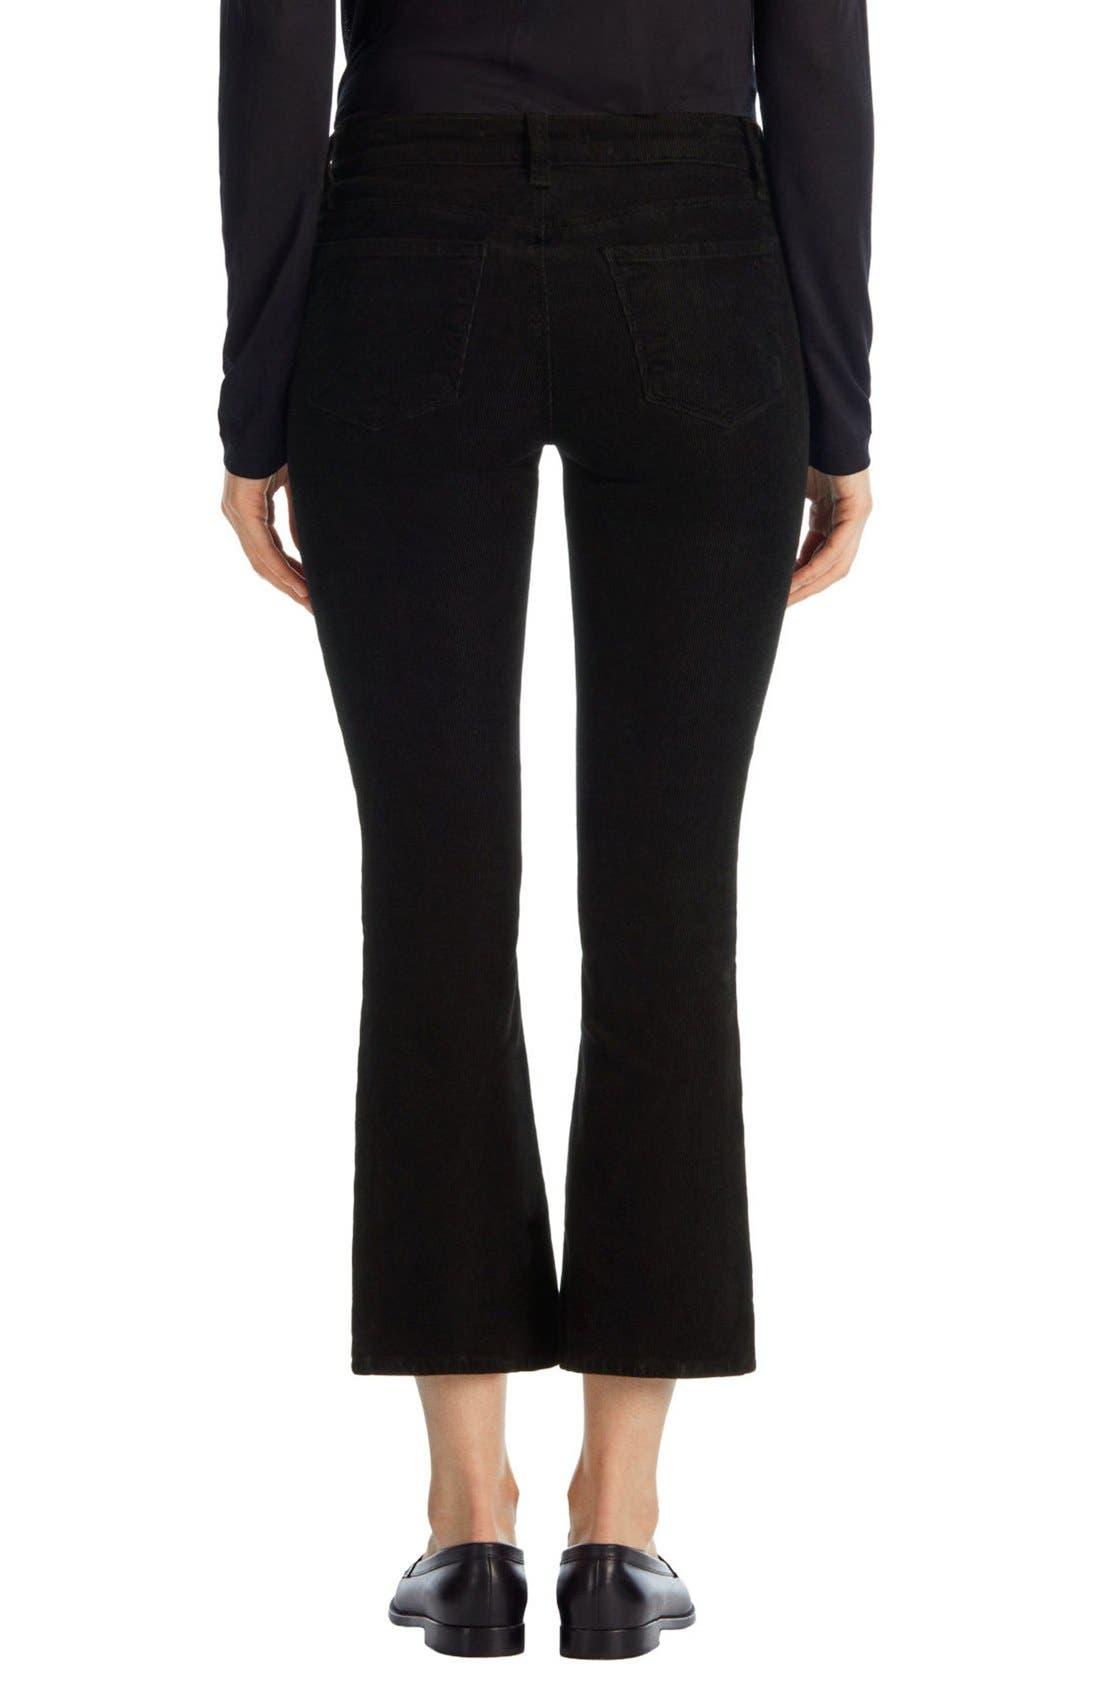 'Selena' Crop Bootcut Corduroy Pants,                             Alternate thumbnail 2, color,                             Black